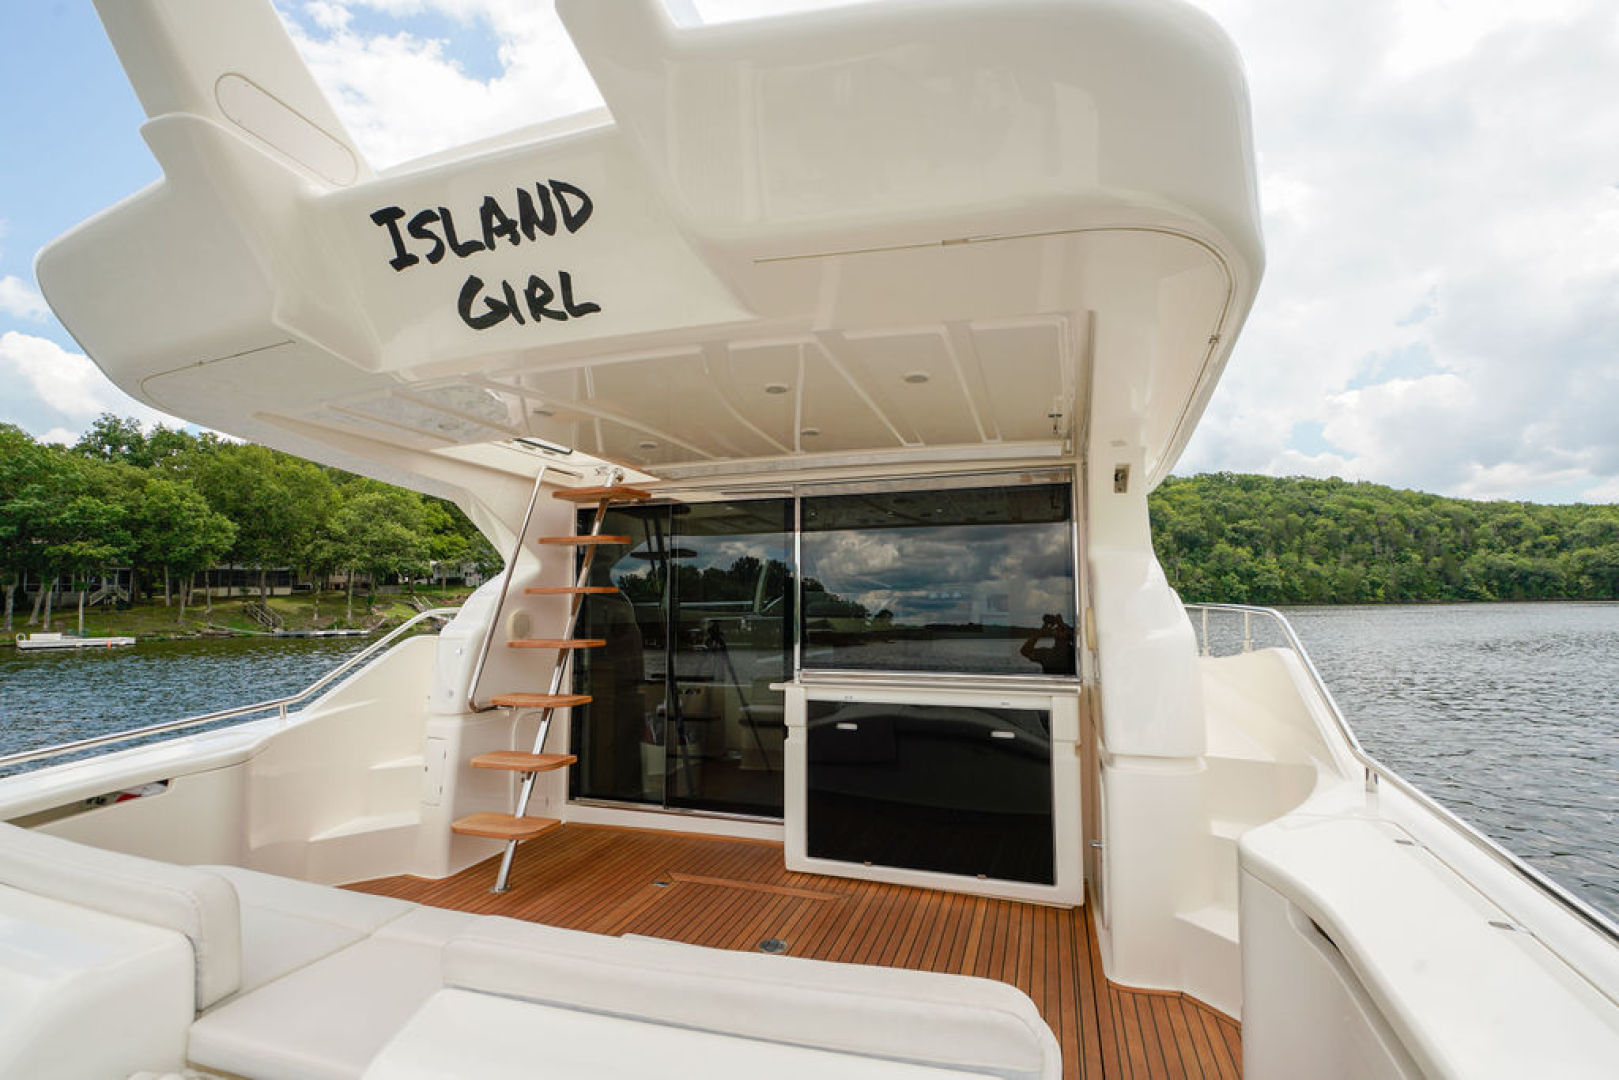 Ferretti Yachts-530 2013-ISLAND GIRL Mount Juliet-Tennessee-United States-1574687   Thumbnail